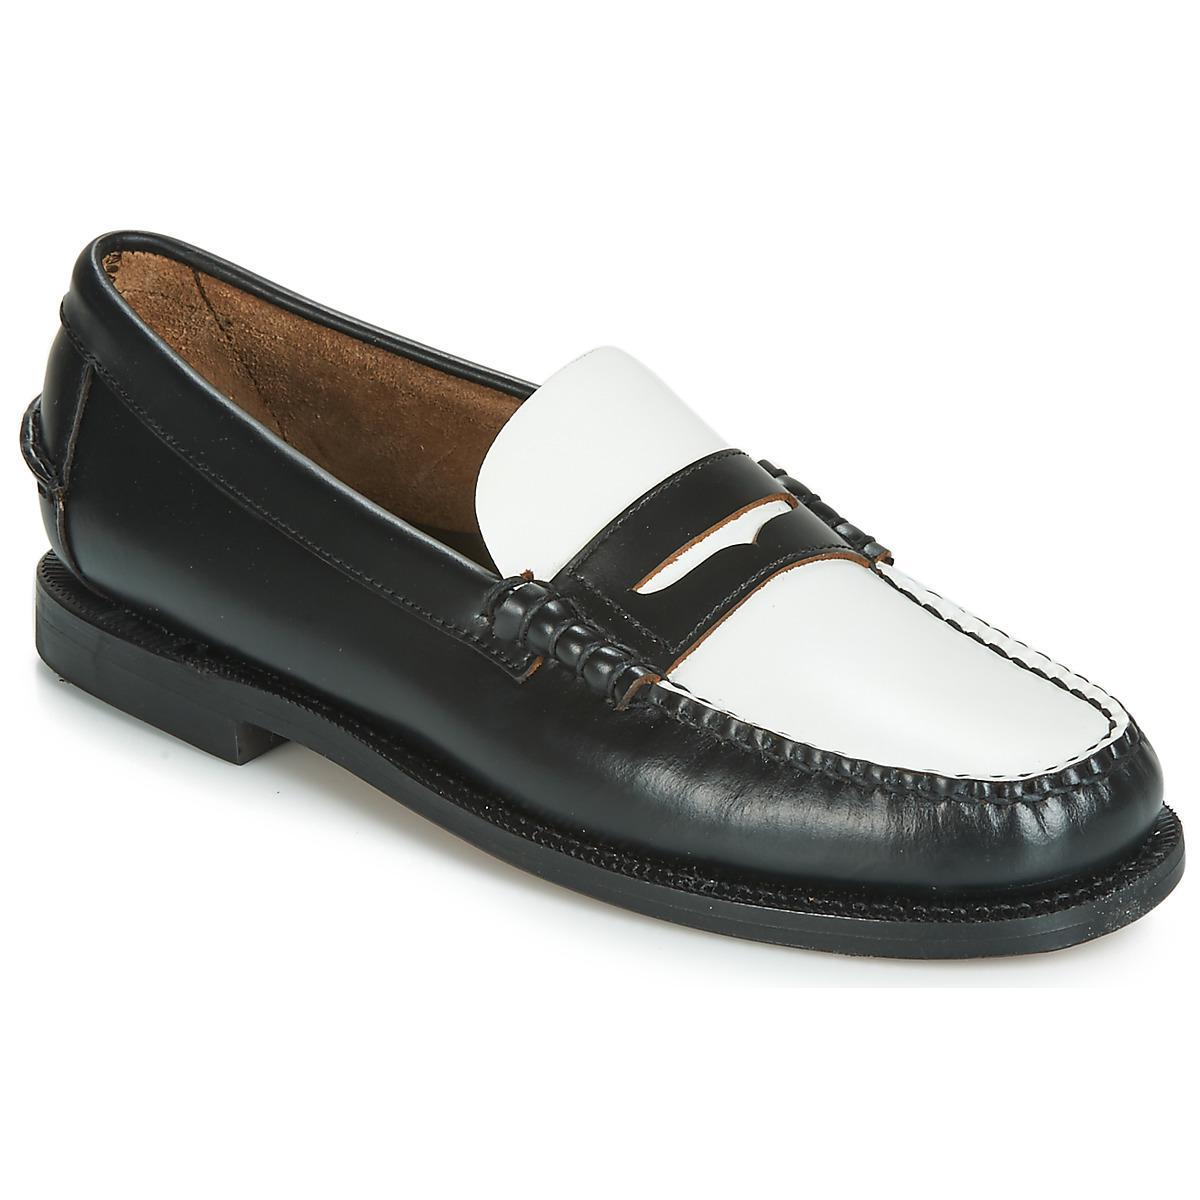 de300100dd9 Sebago Classic Dan W Loafers   Casual Shoes in Black - Lyst